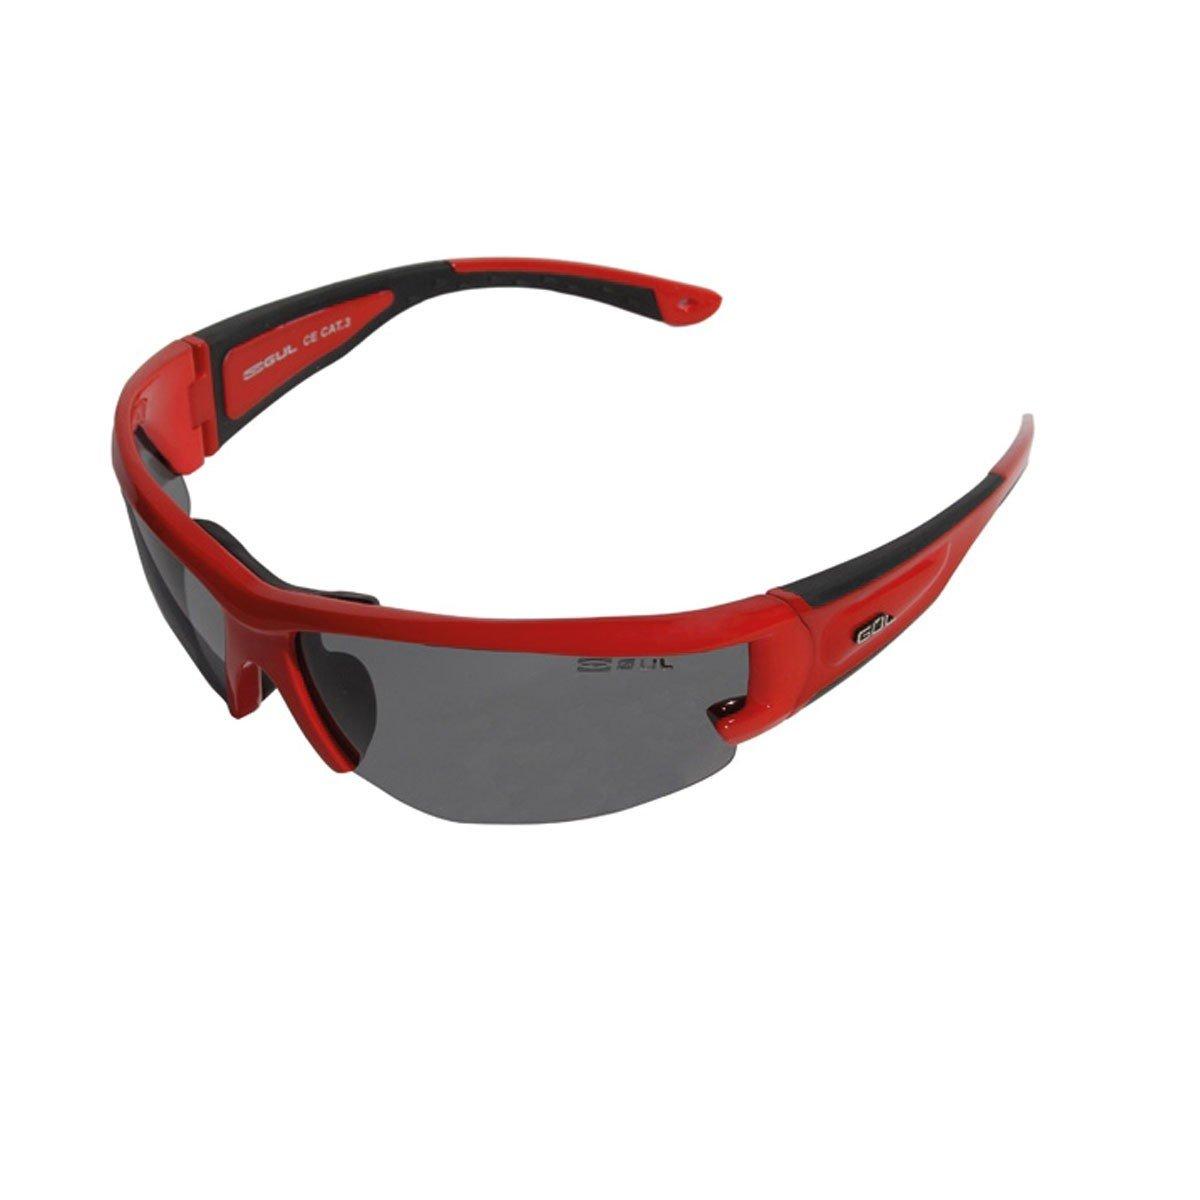 Gul Code Zero Race Floating Sunglasses   Sg0002-A3